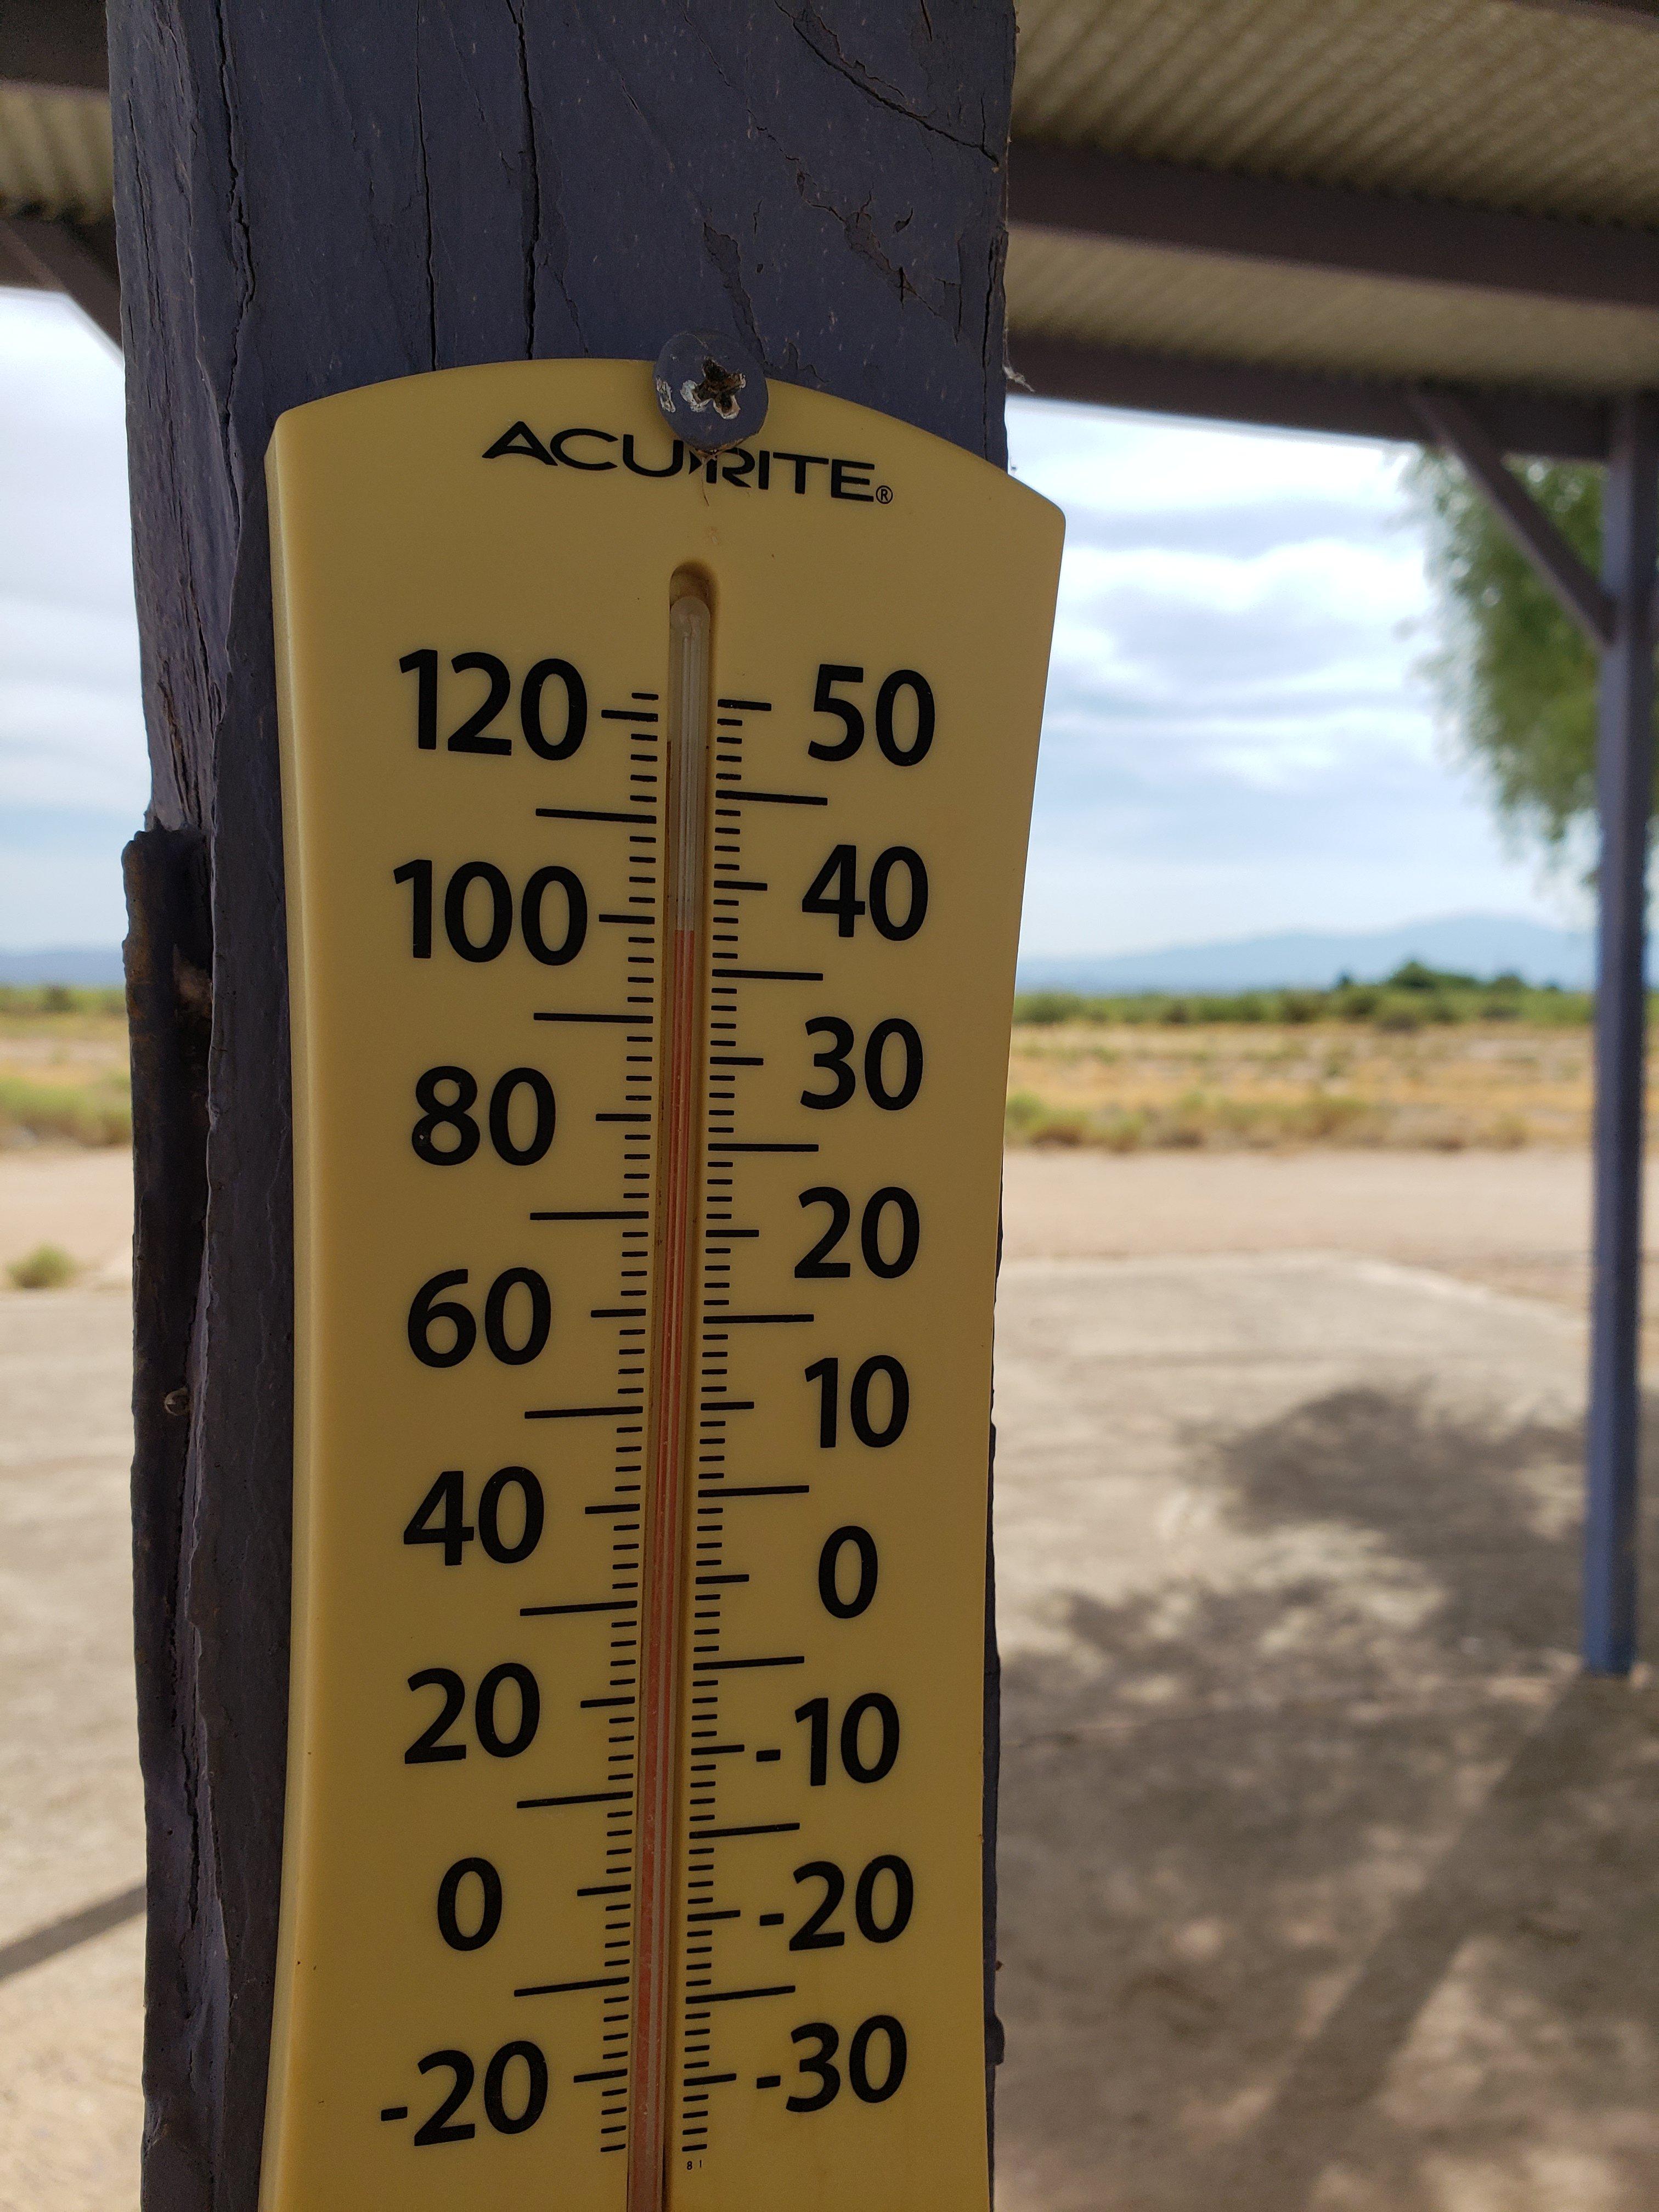 Thermometer 28 Jul 19.jpg